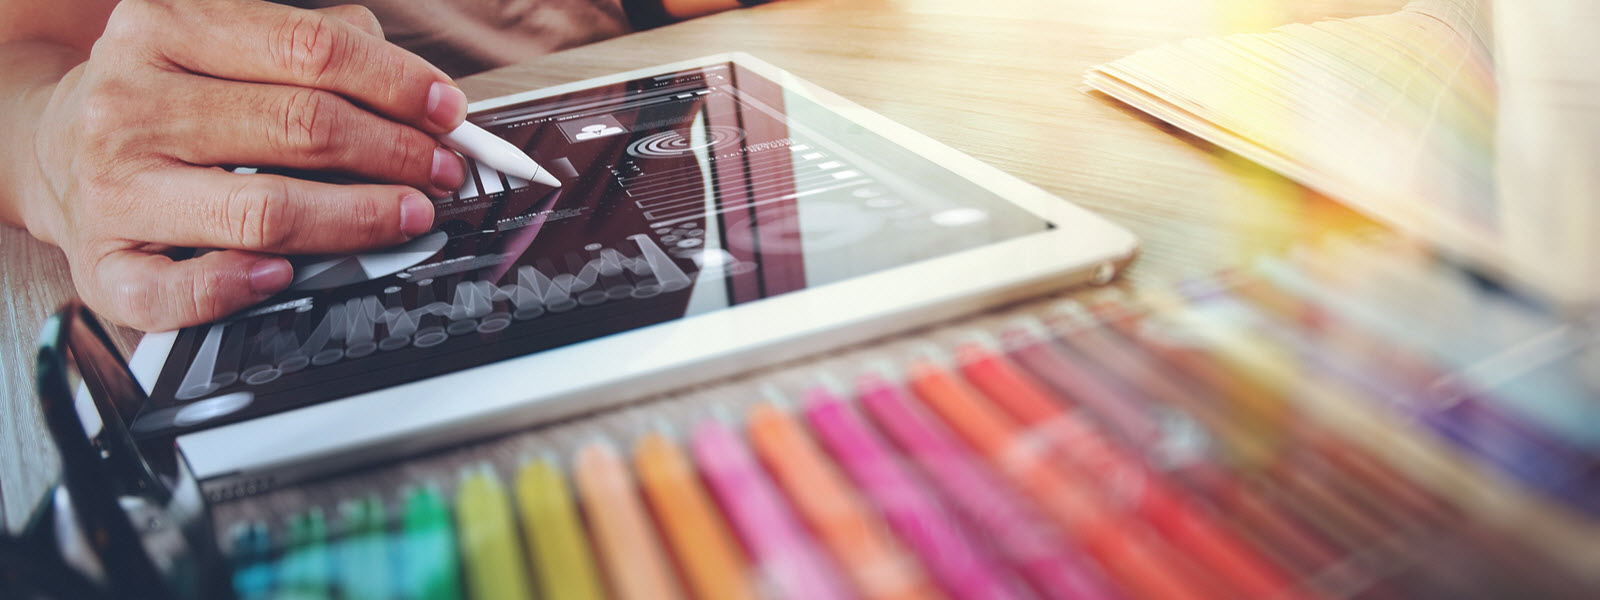 Webinar: Drive Digital Transformation with Innovation